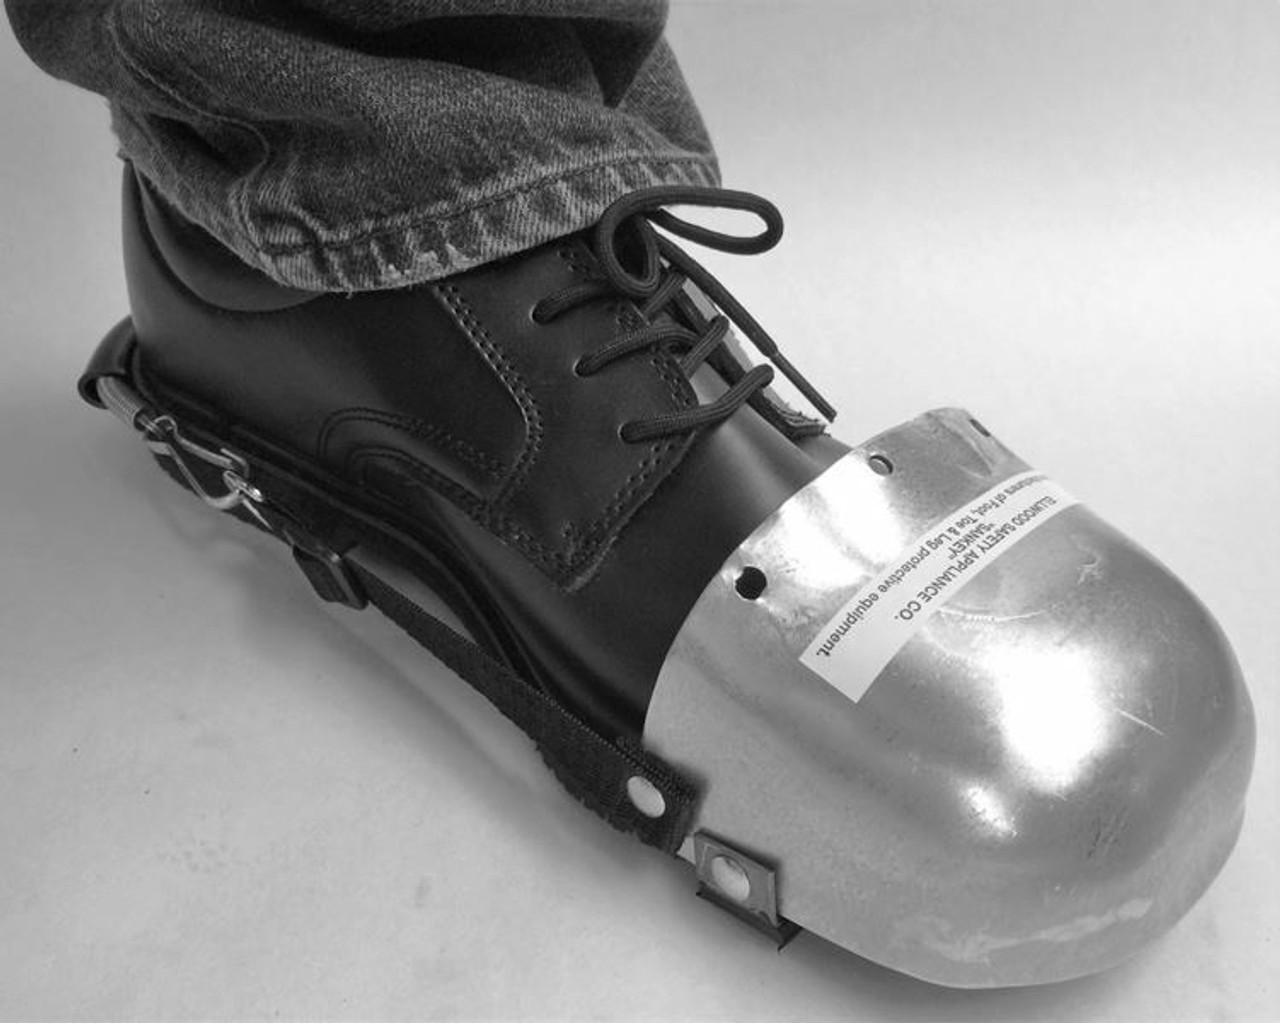 Ellwood Steel Toe Guards (700)